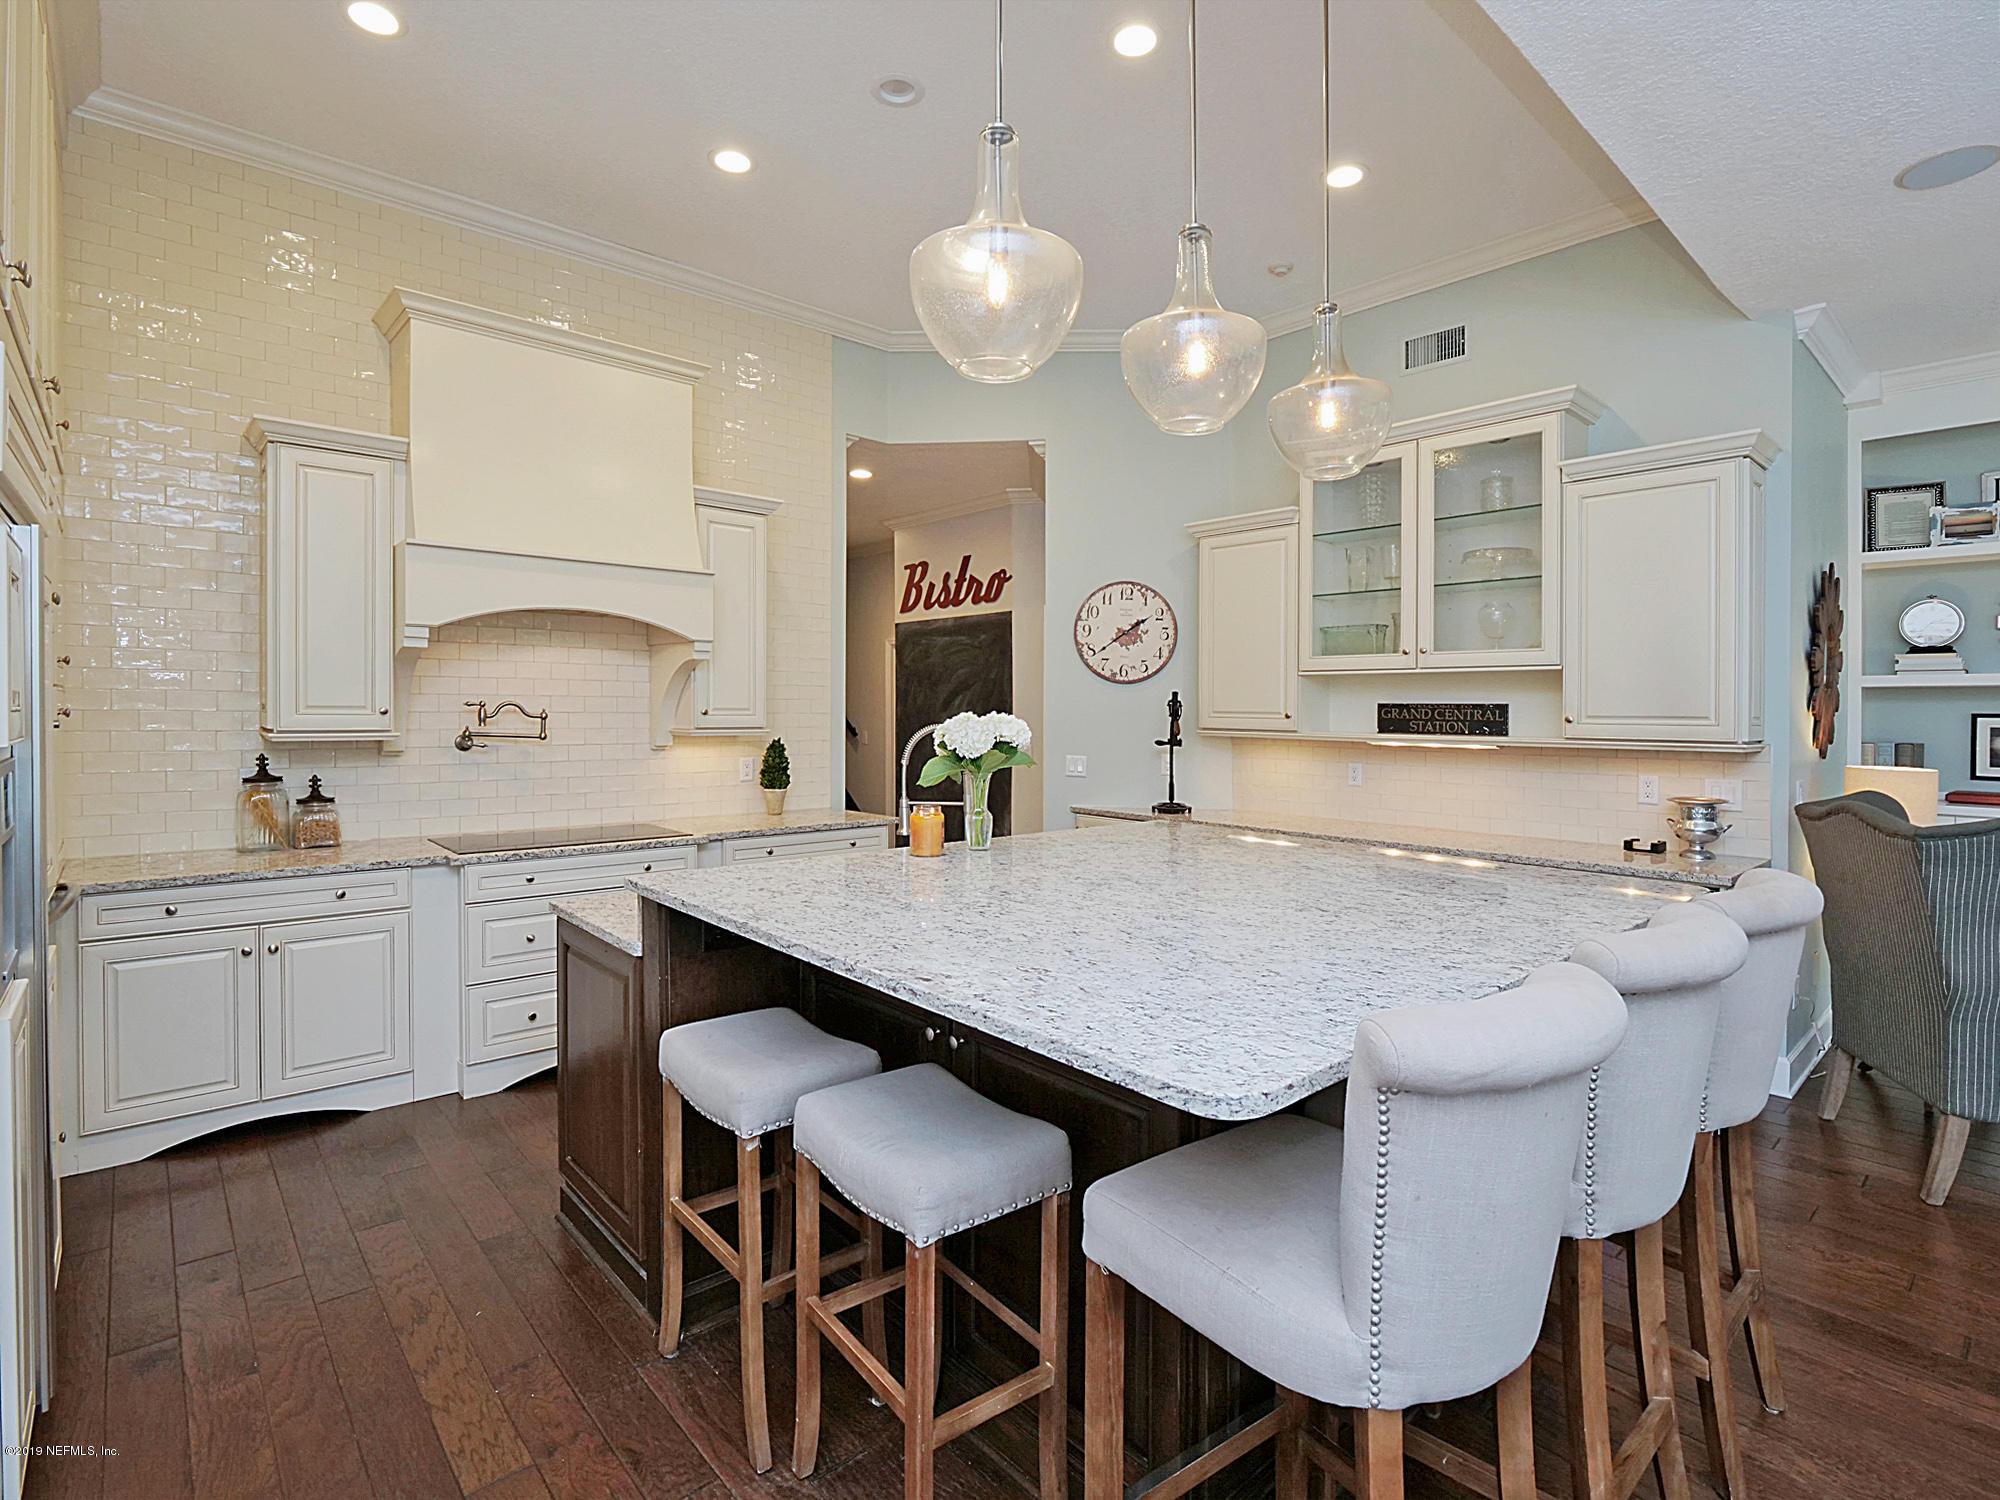 8988 LAKE KATHRYN, PONTE VEDRA BEACH, FLORIDA 32082, 5 Bedrooms Bedrooms, ,4 BathroomsBathrooms,Residential - single family,For sale,LAKE KATHRYN,981932